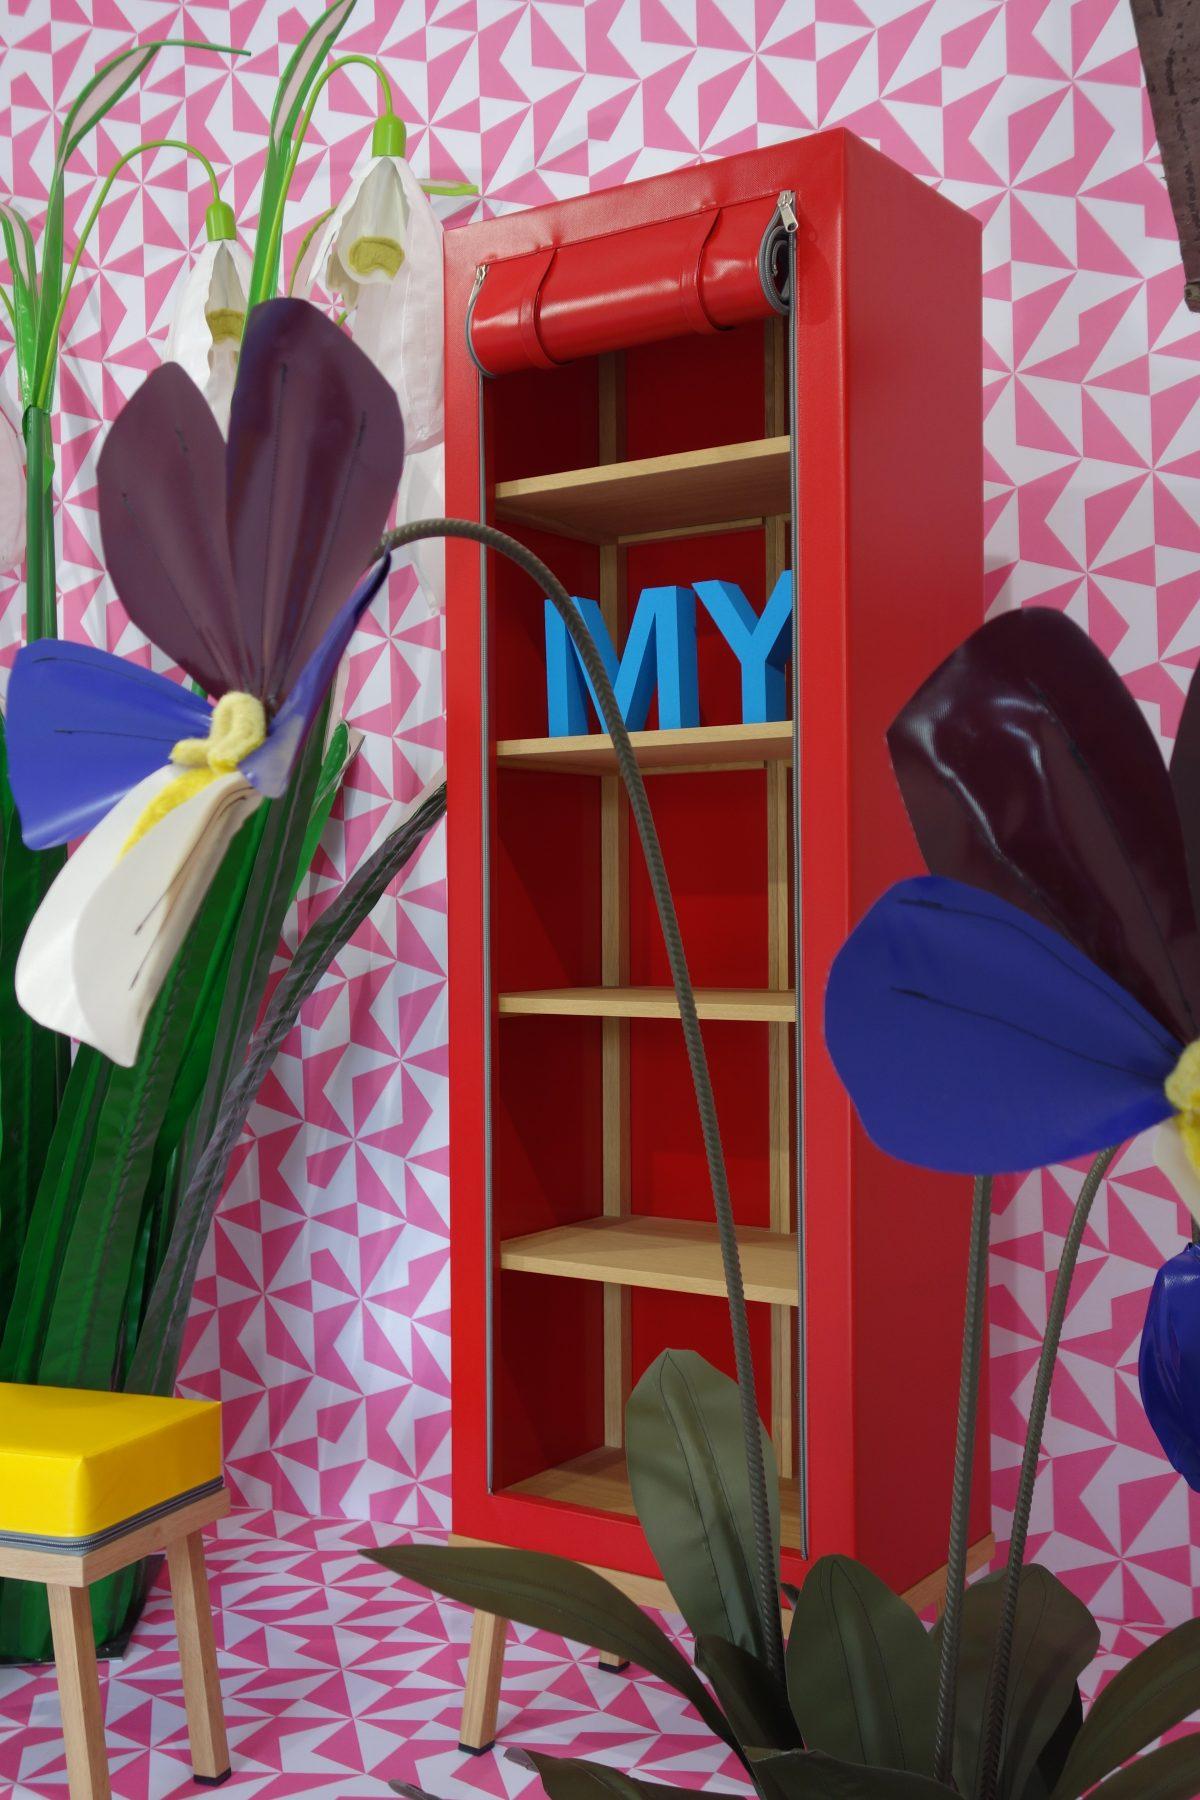 Truecolors-cabinet-VisserMeijwaard-kissMyName -photogimmii